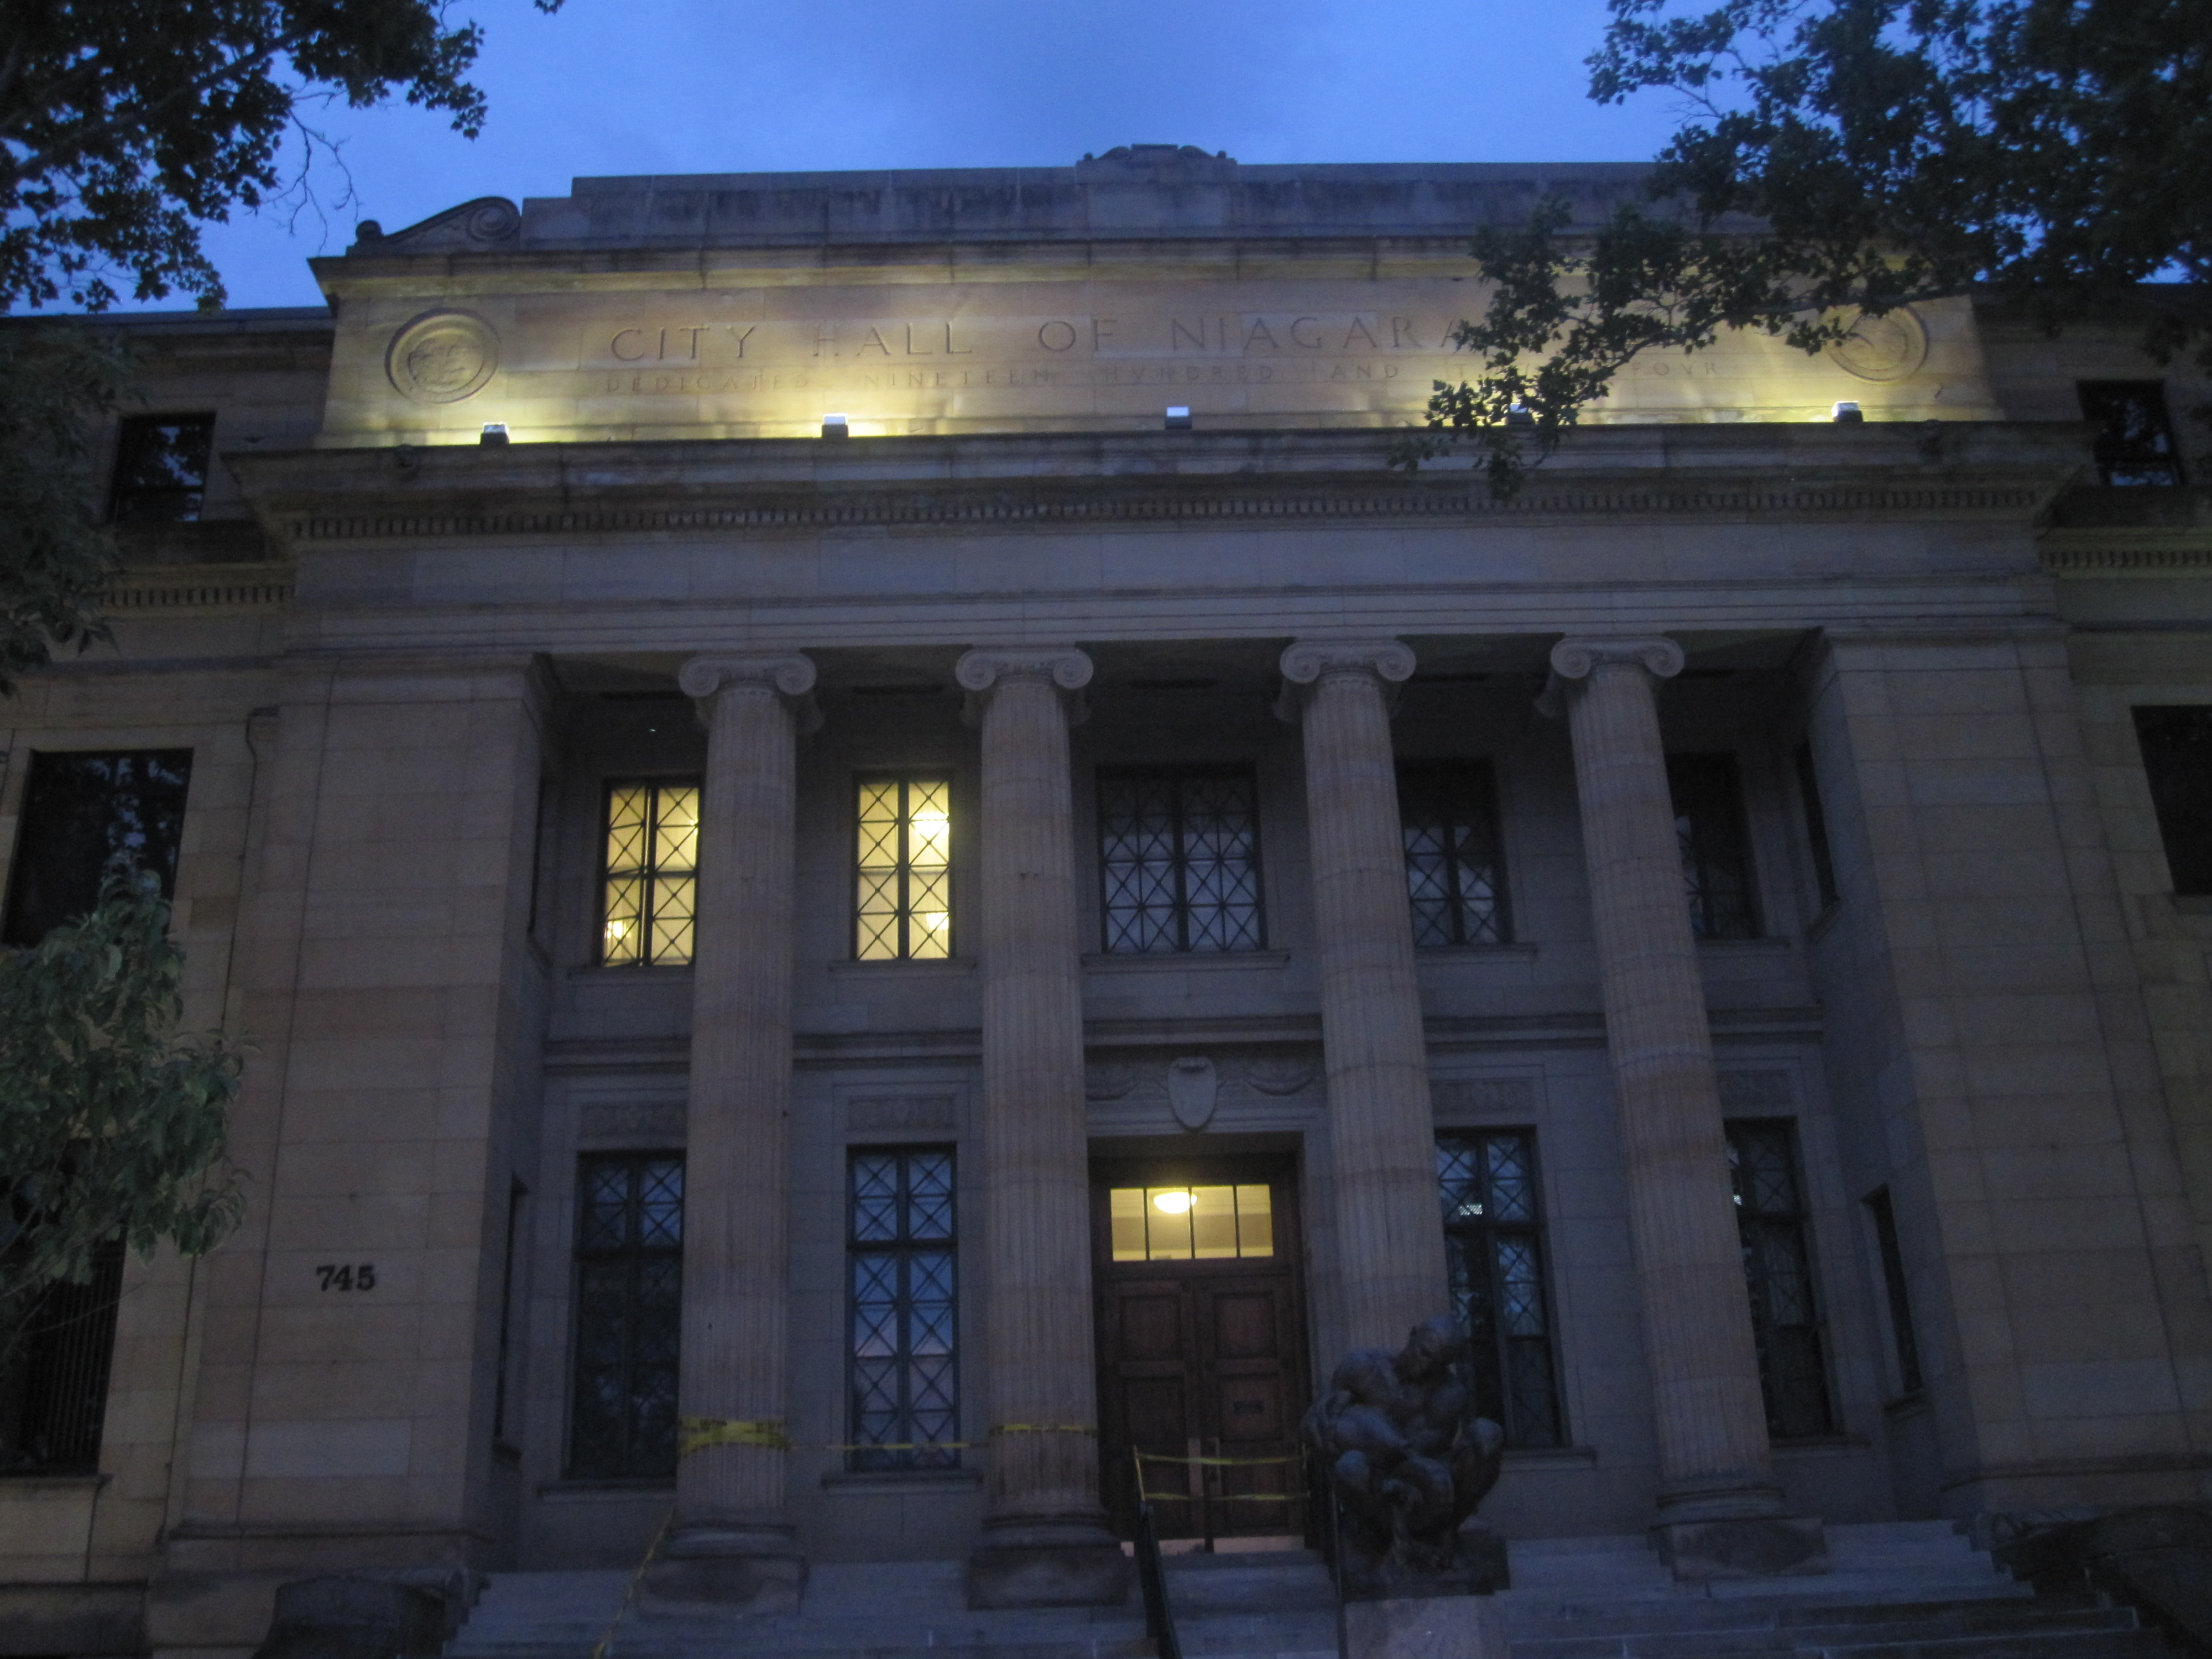 Archivo Niagara Falls Ny City Hall At Night Img 1461 Jpg